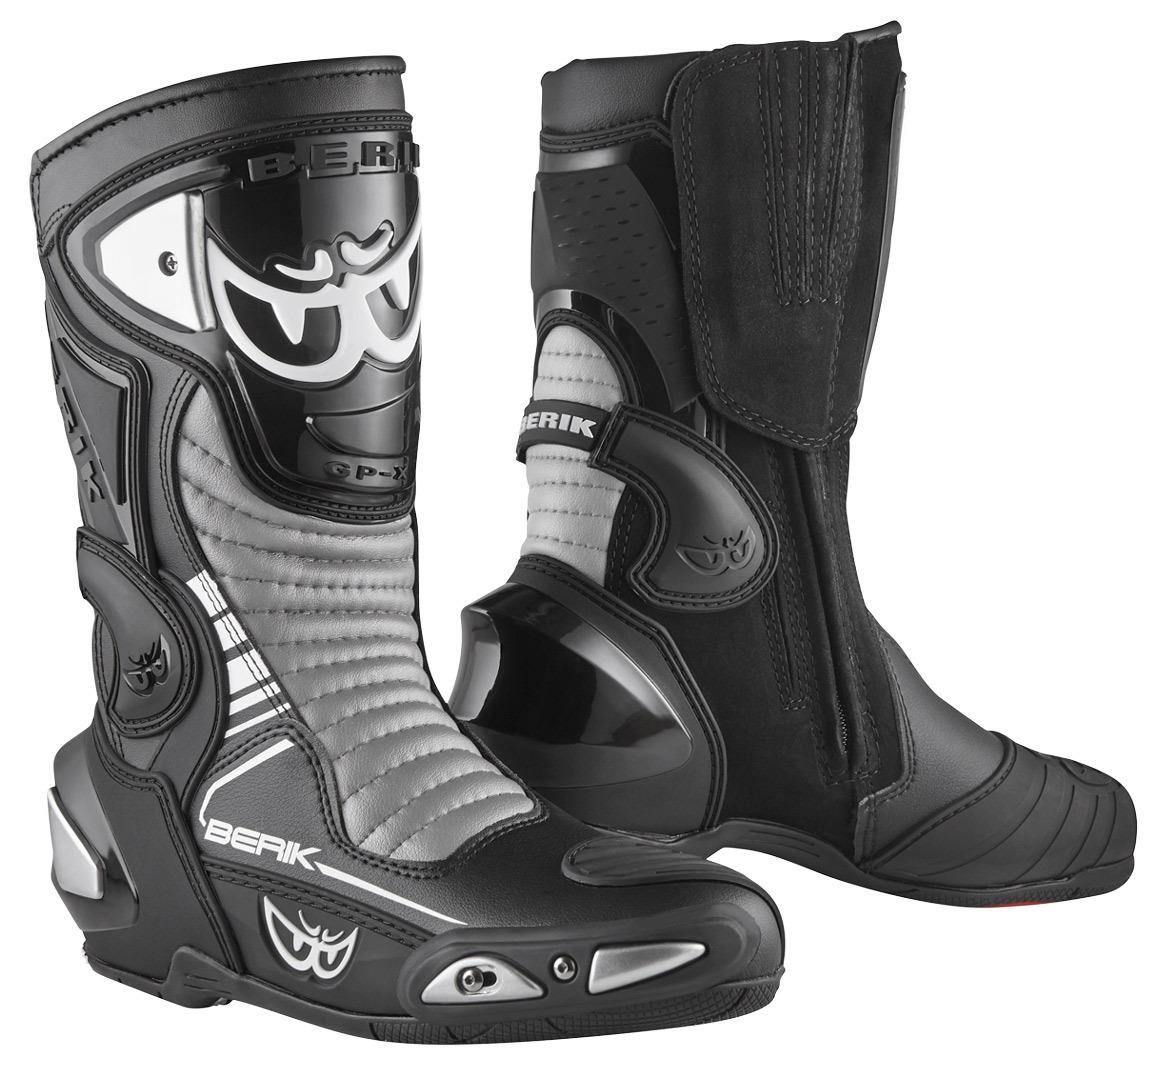 Berik Race-X EVO Motorradstiefel, schwarz-grau-weiss, Größe 46, schwarz-grau-weiss, Größe 46